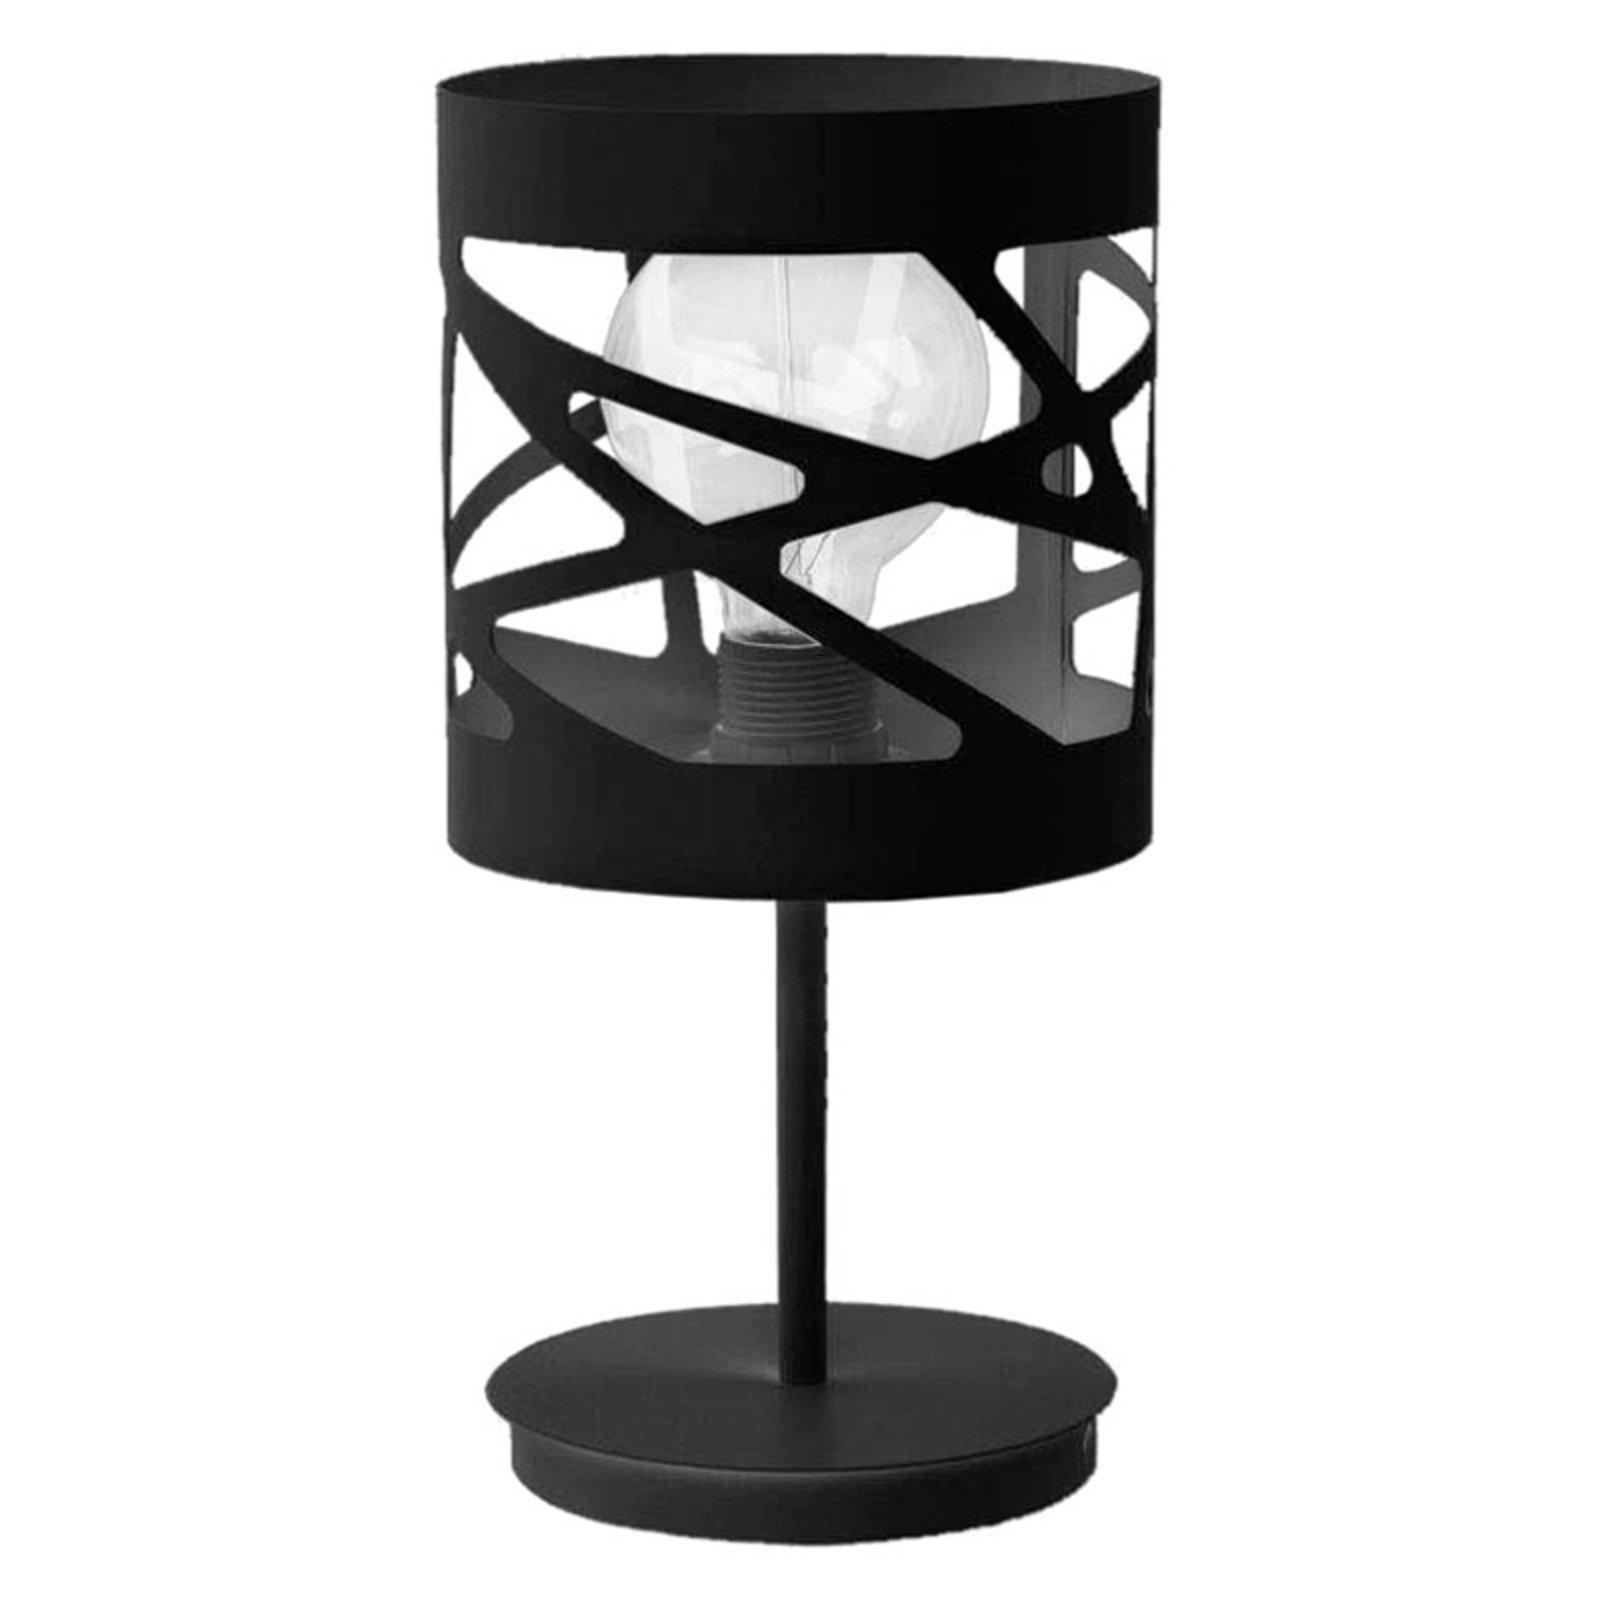 Bordlampe Modul Frez mønsterskjerm Ø17,5cm svart